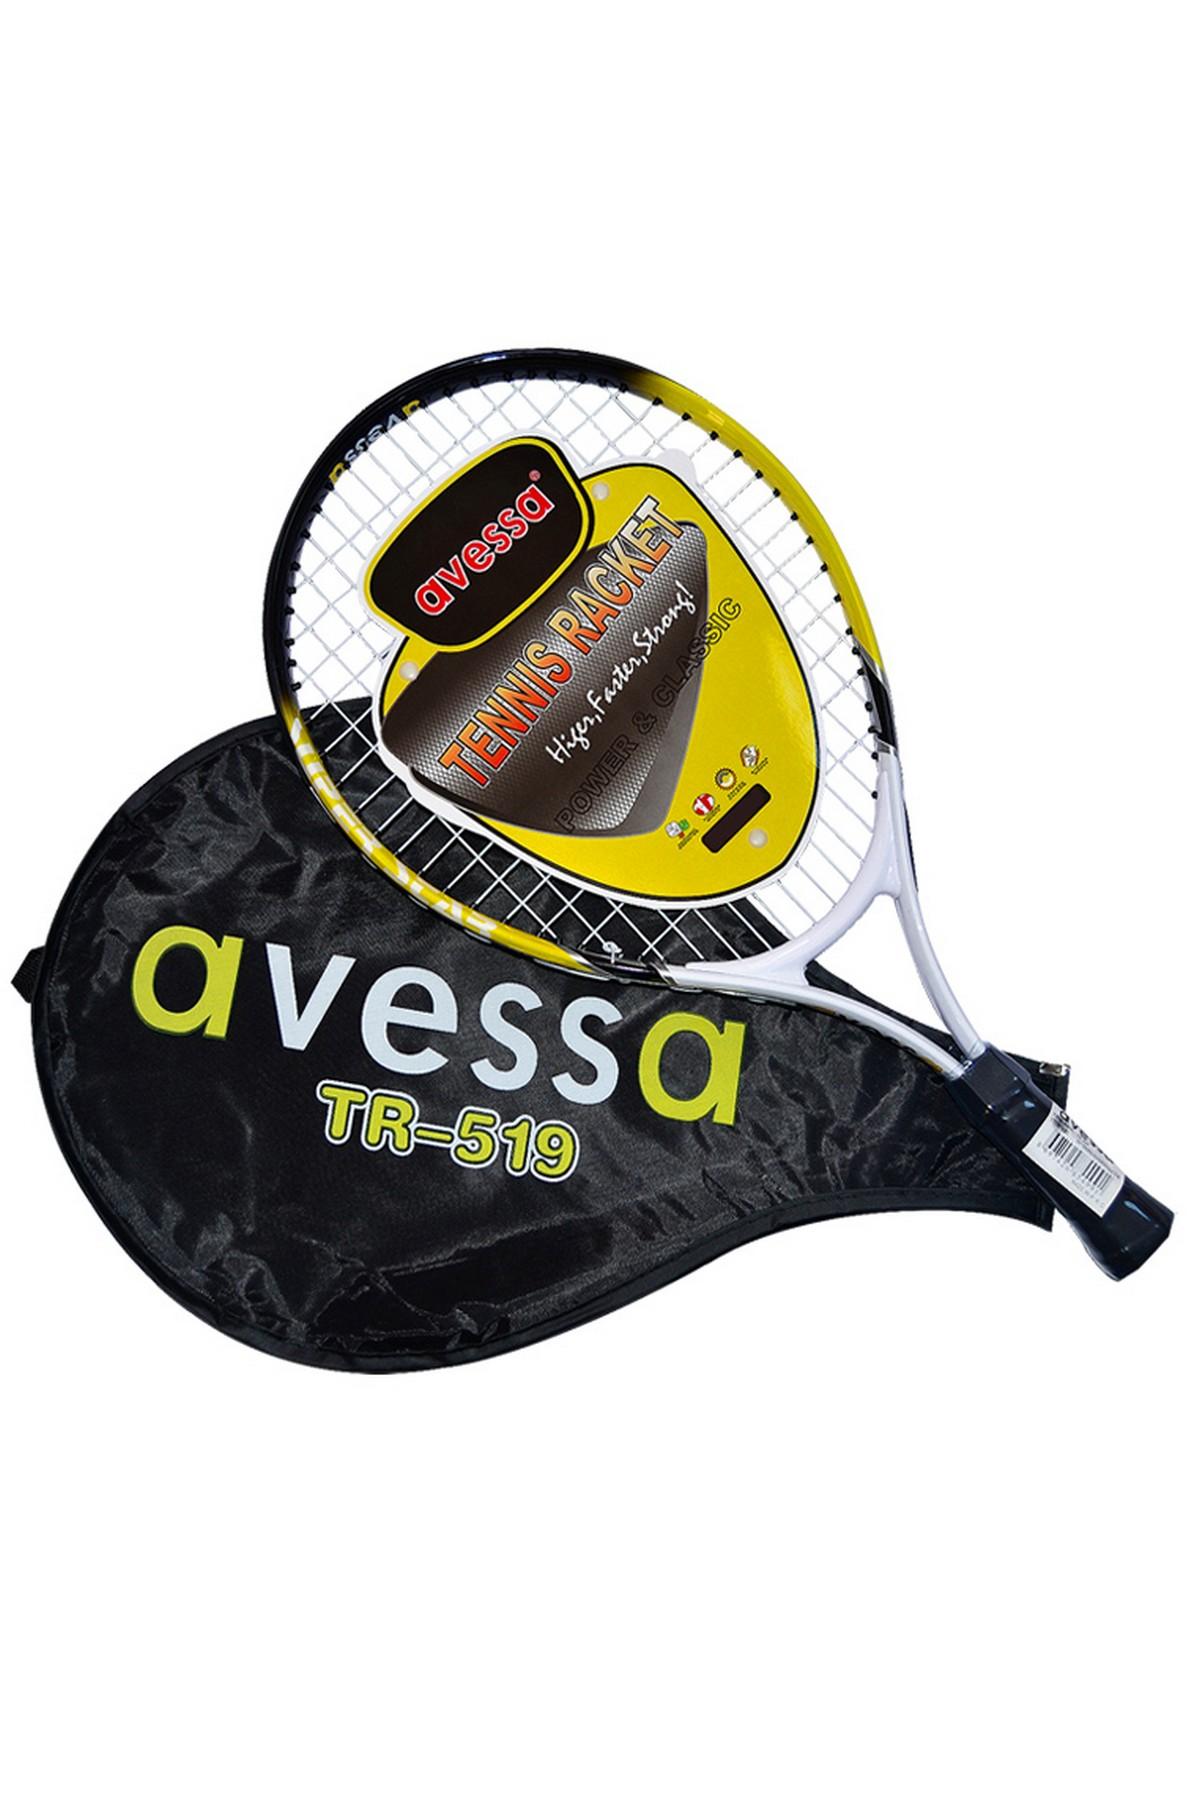 Avessa TR-519 - Kılıflı 19Inch Tenis Raketi